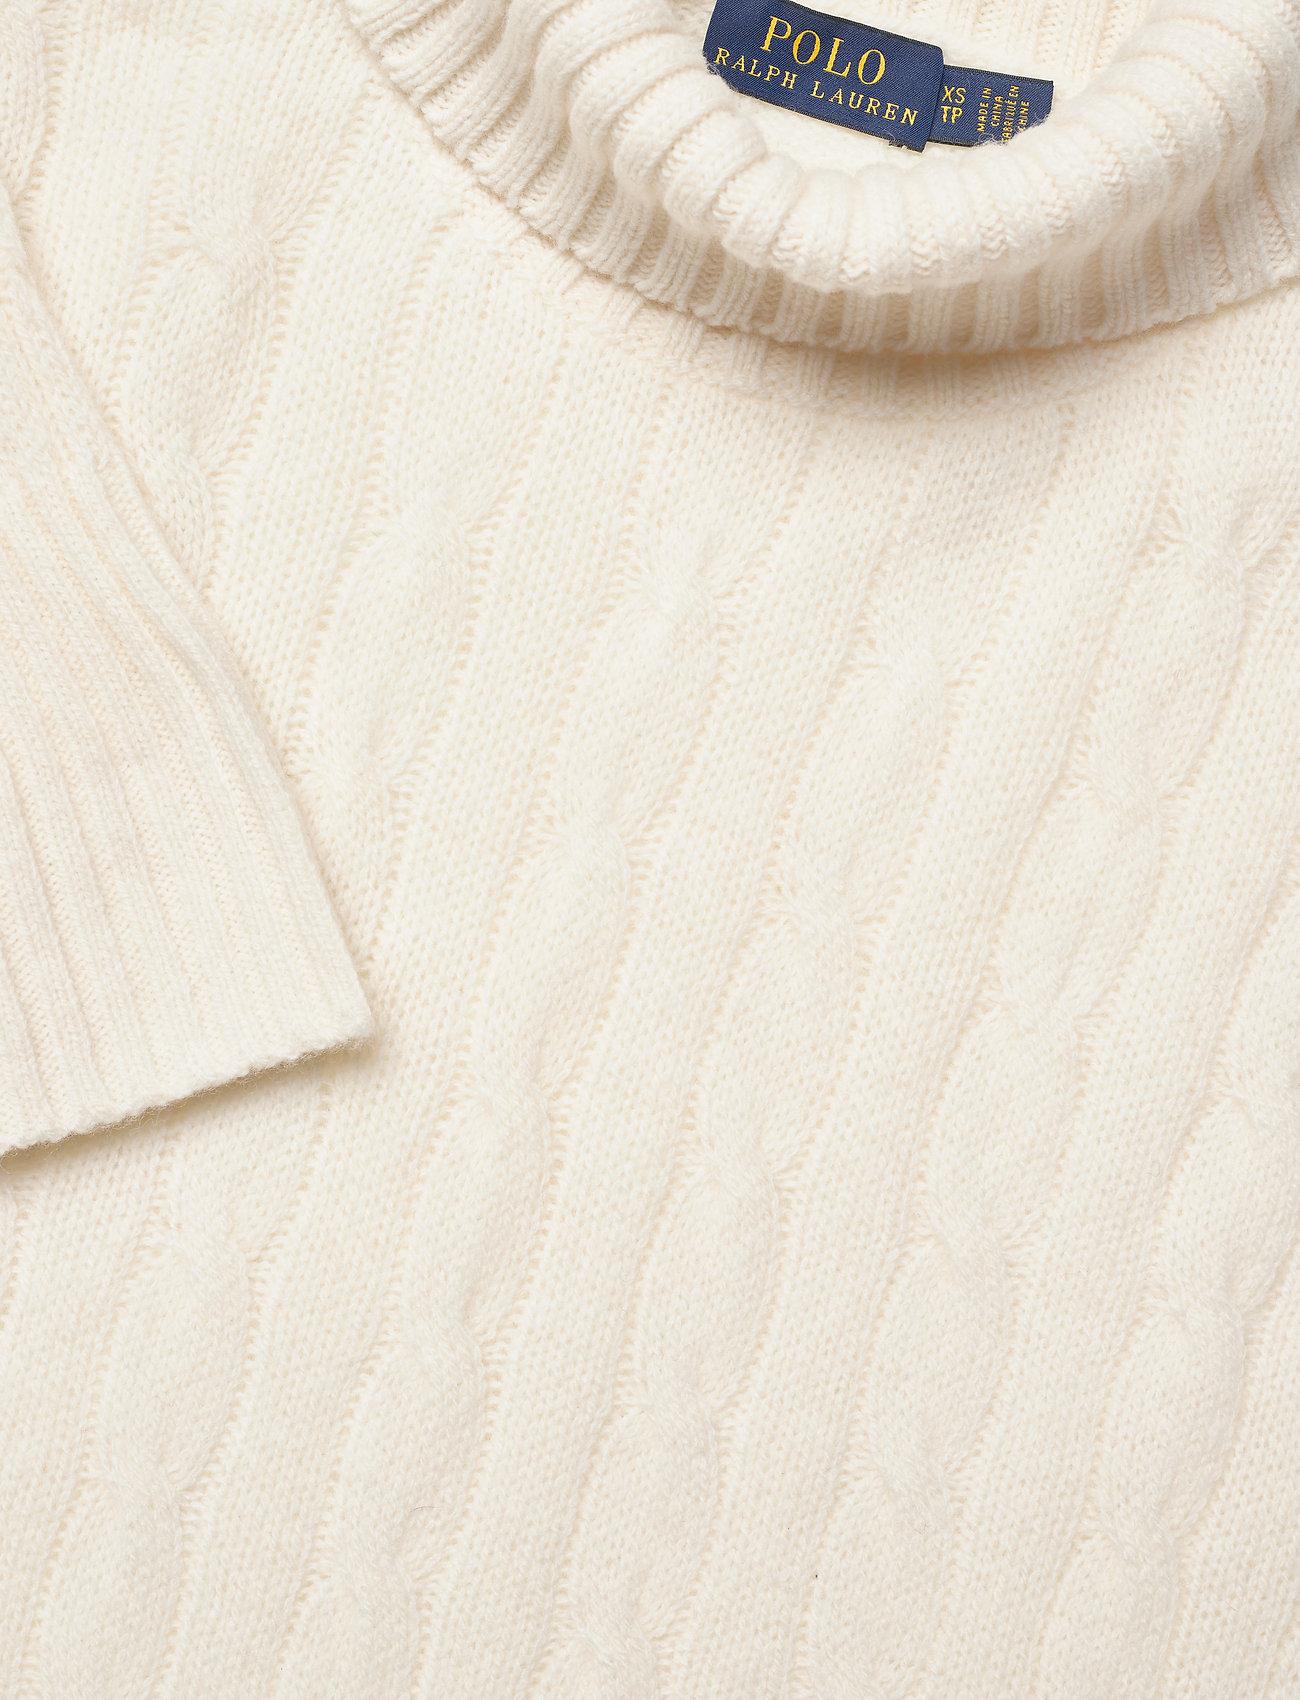 Cable-knit Turtleneck Sweater (Cream) (906.95 kr) - Polo Ralph Lauren